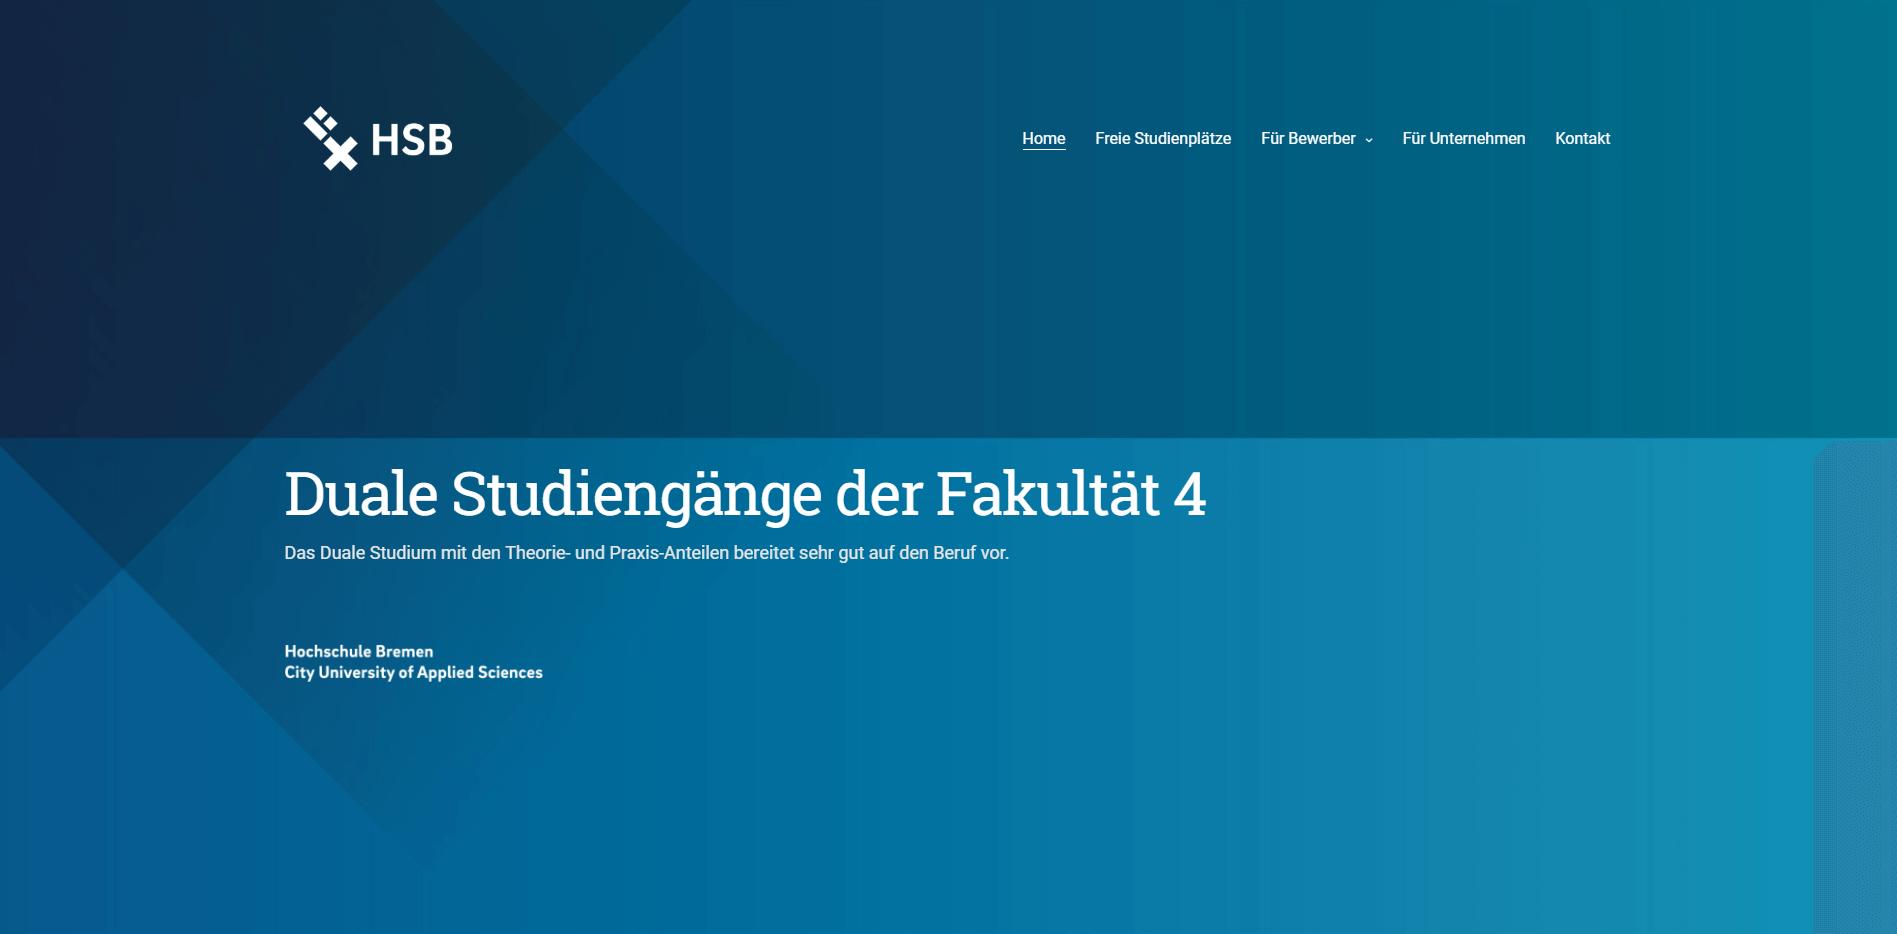 responsive website hochschule bremen fak4 - Hochschule Bremen - Fakultät 4